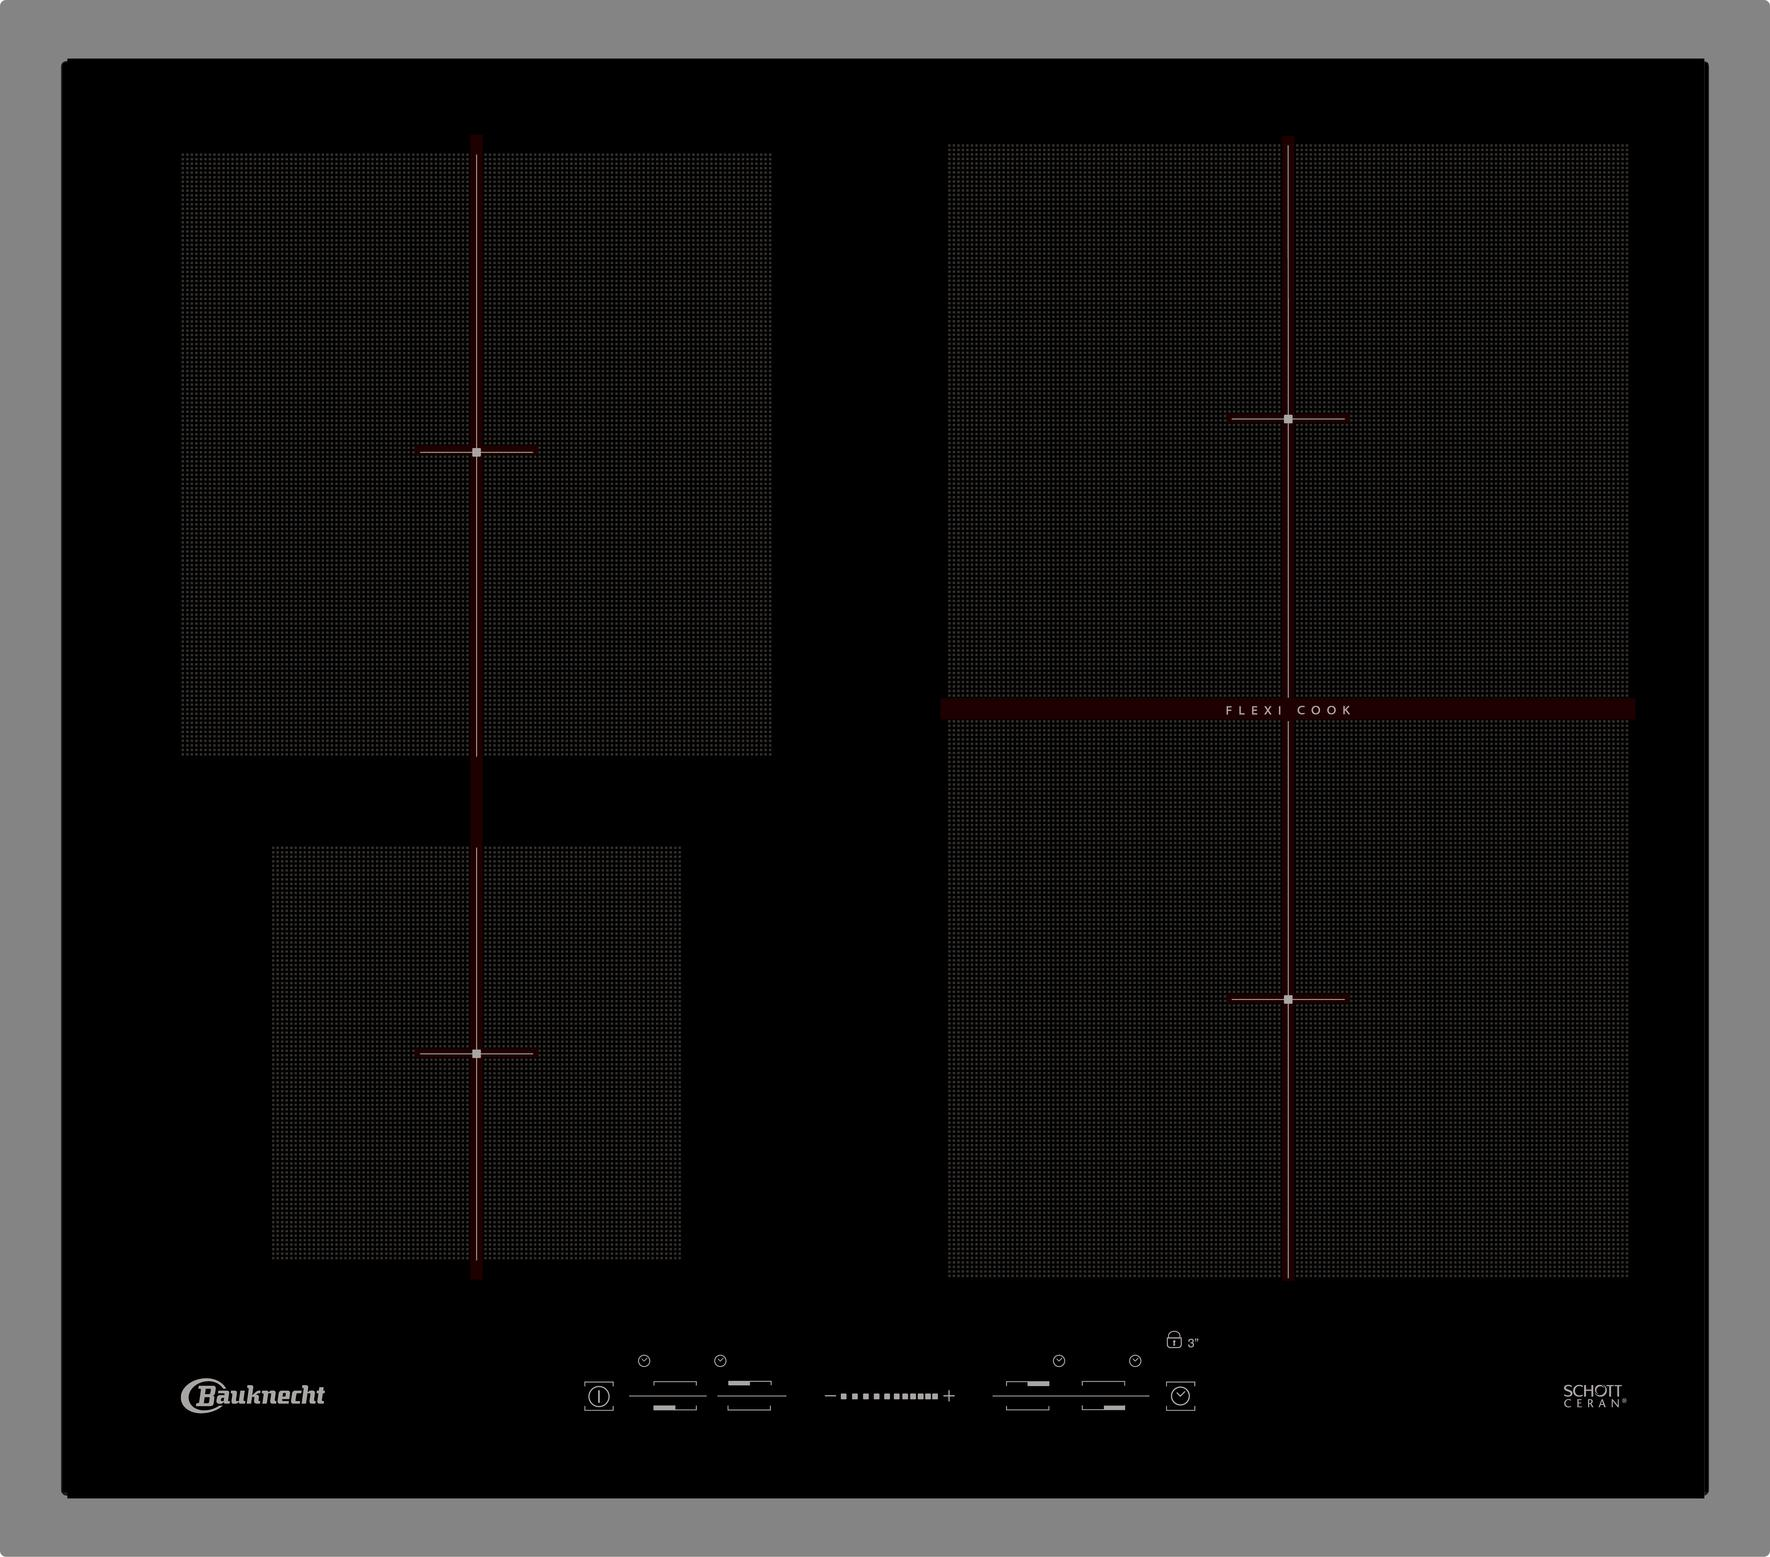 bauknecht esif 6640 in kochfeld elektro induktion 58. Black Bedroom Furniture Sets. Home Design Ideas